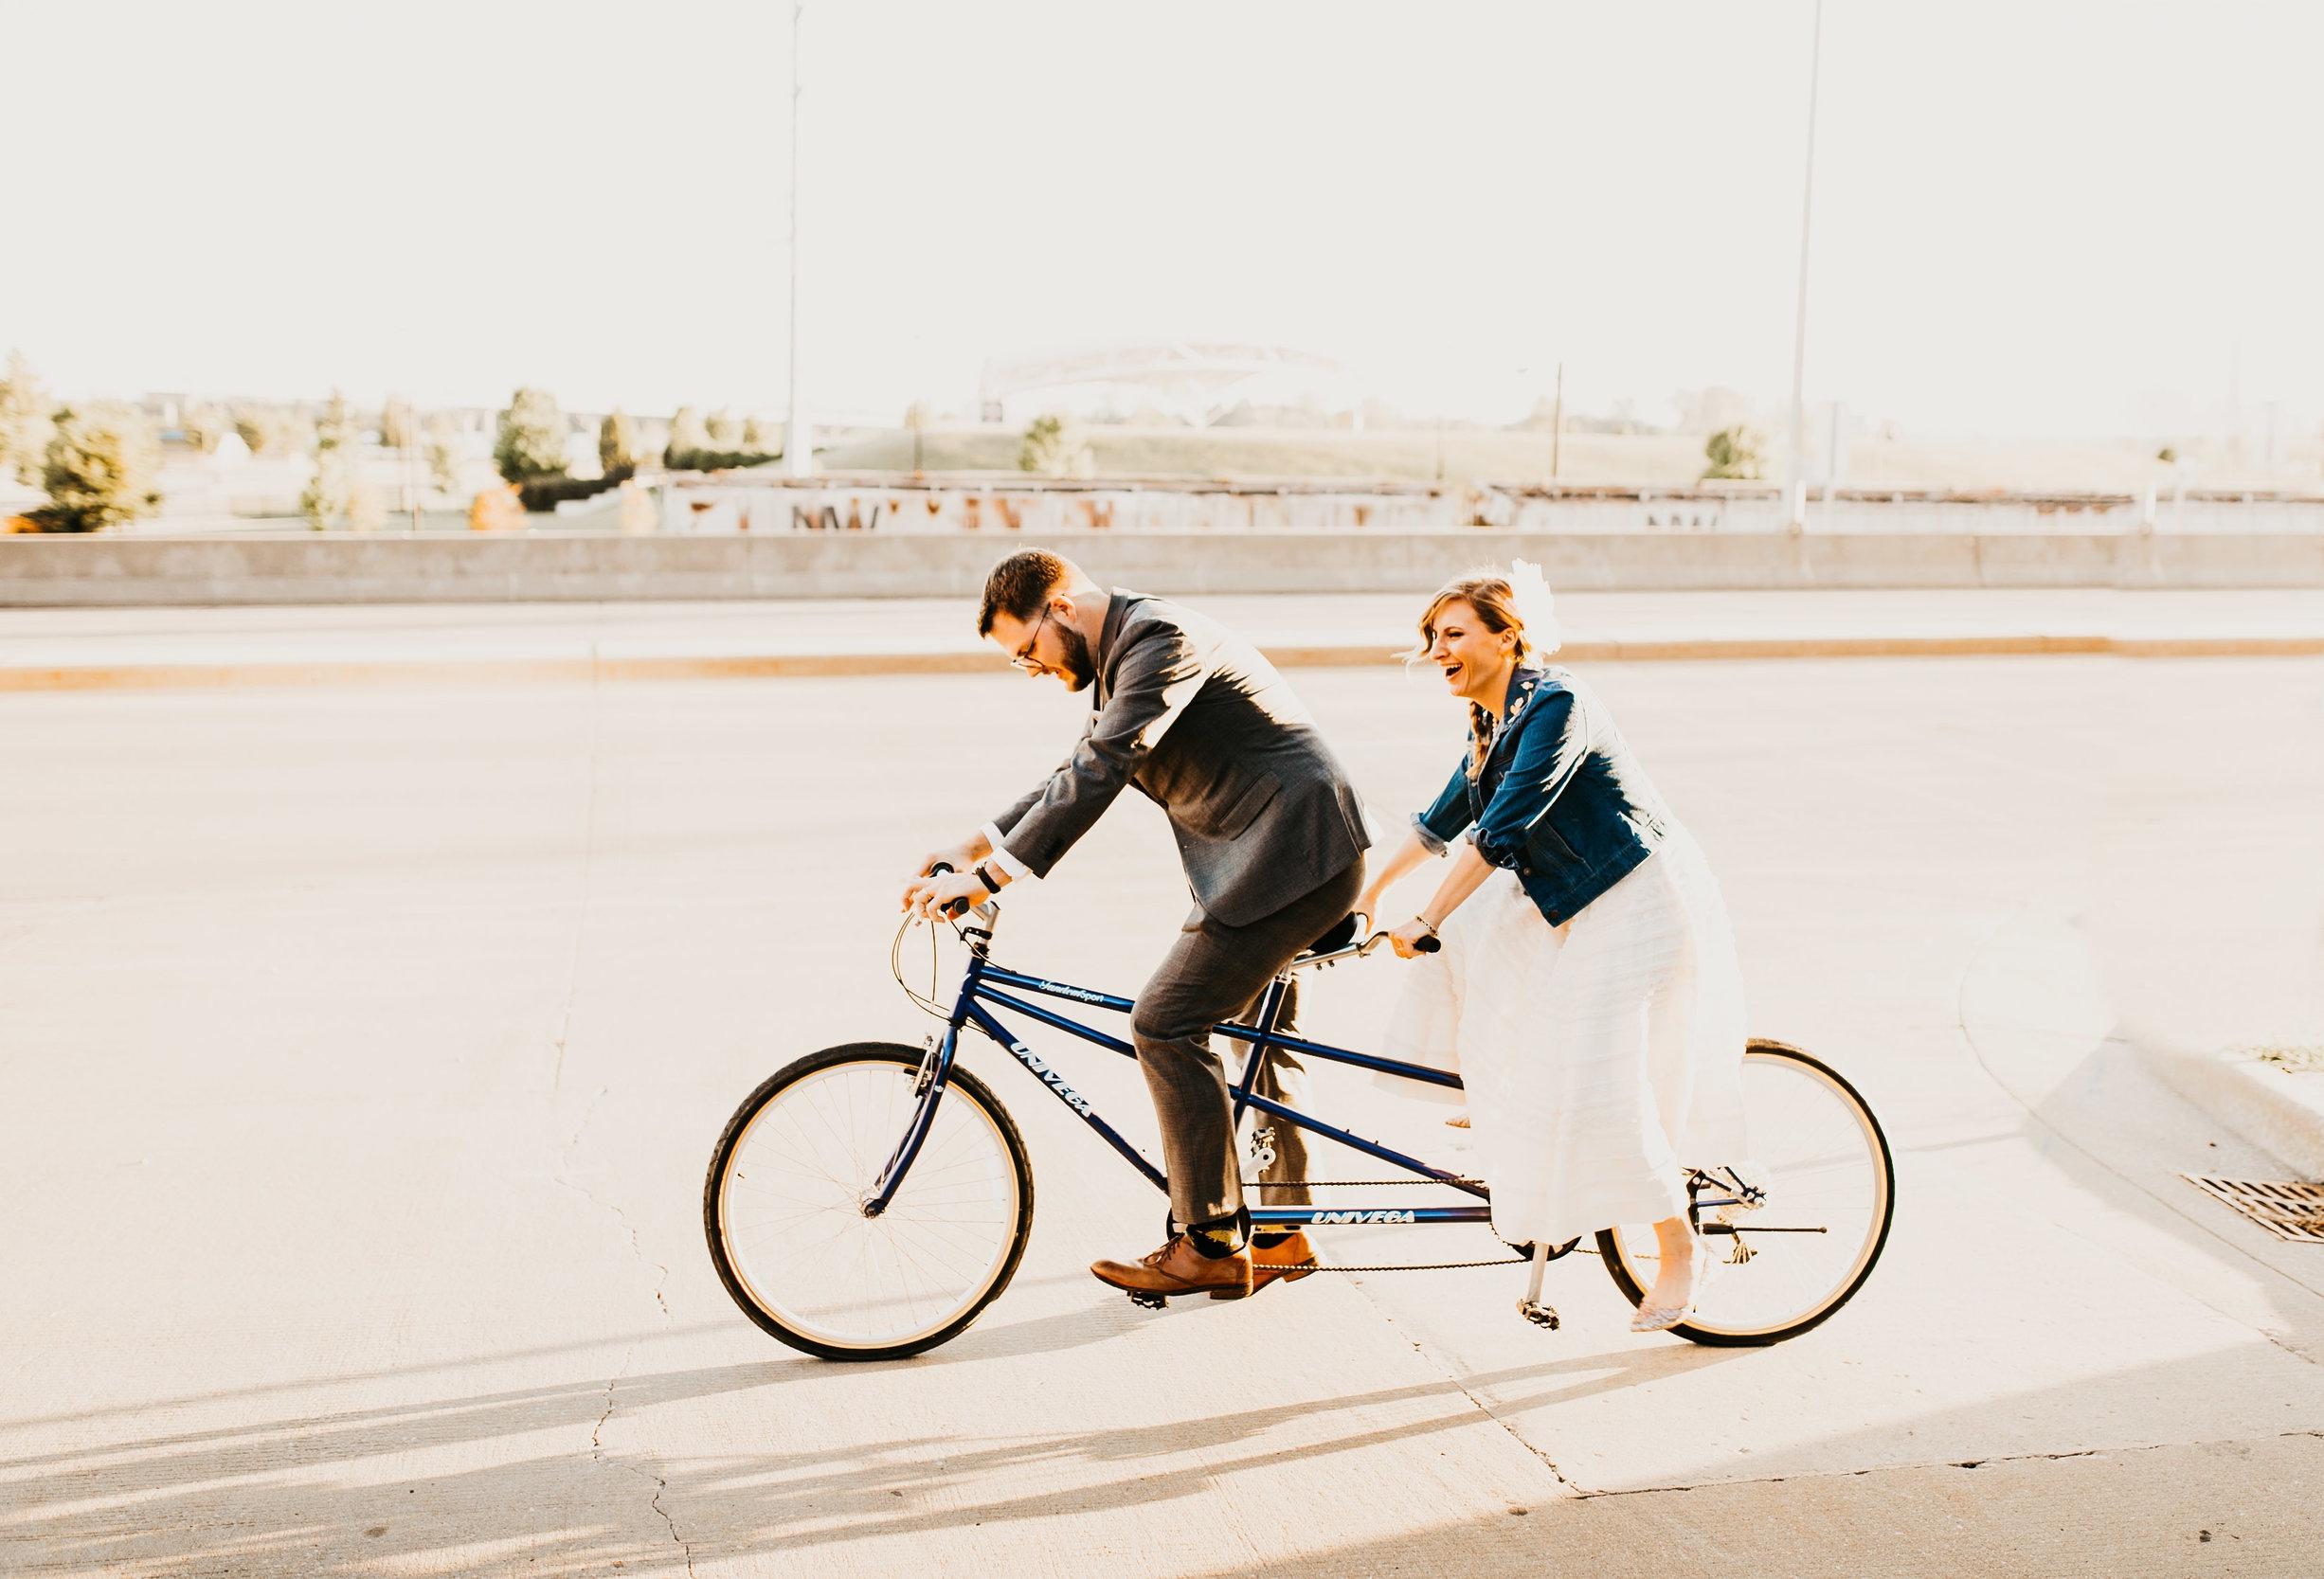 uprooted-traveler-courtney-smith-tandem-bicycle-honeymoon-registry-wanderable-honeyfund